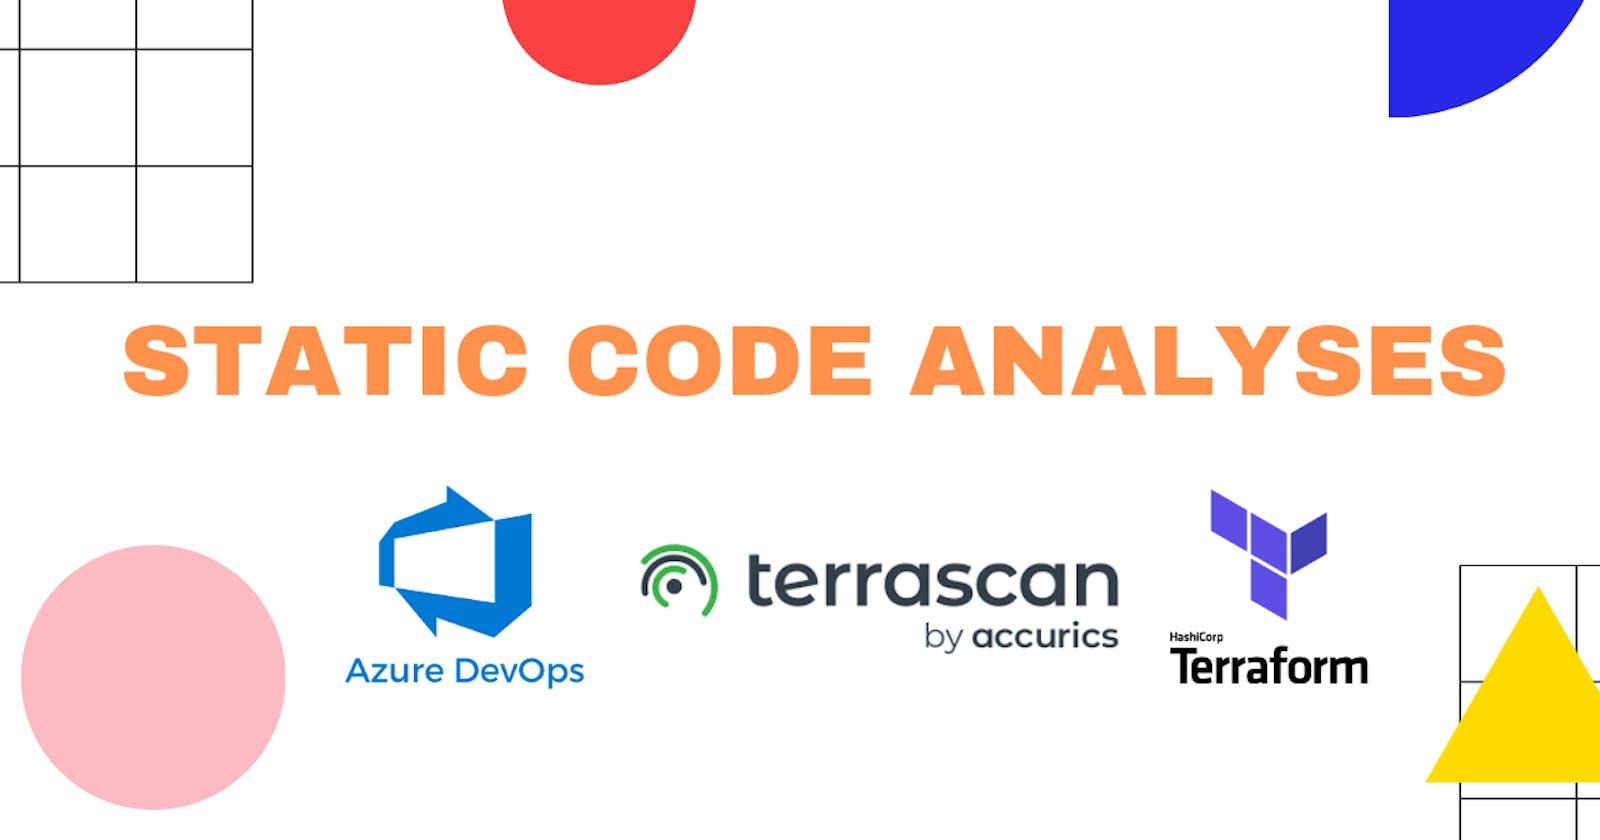 Static Code Analyses - Terrascan, Terraform and Azure DevOps